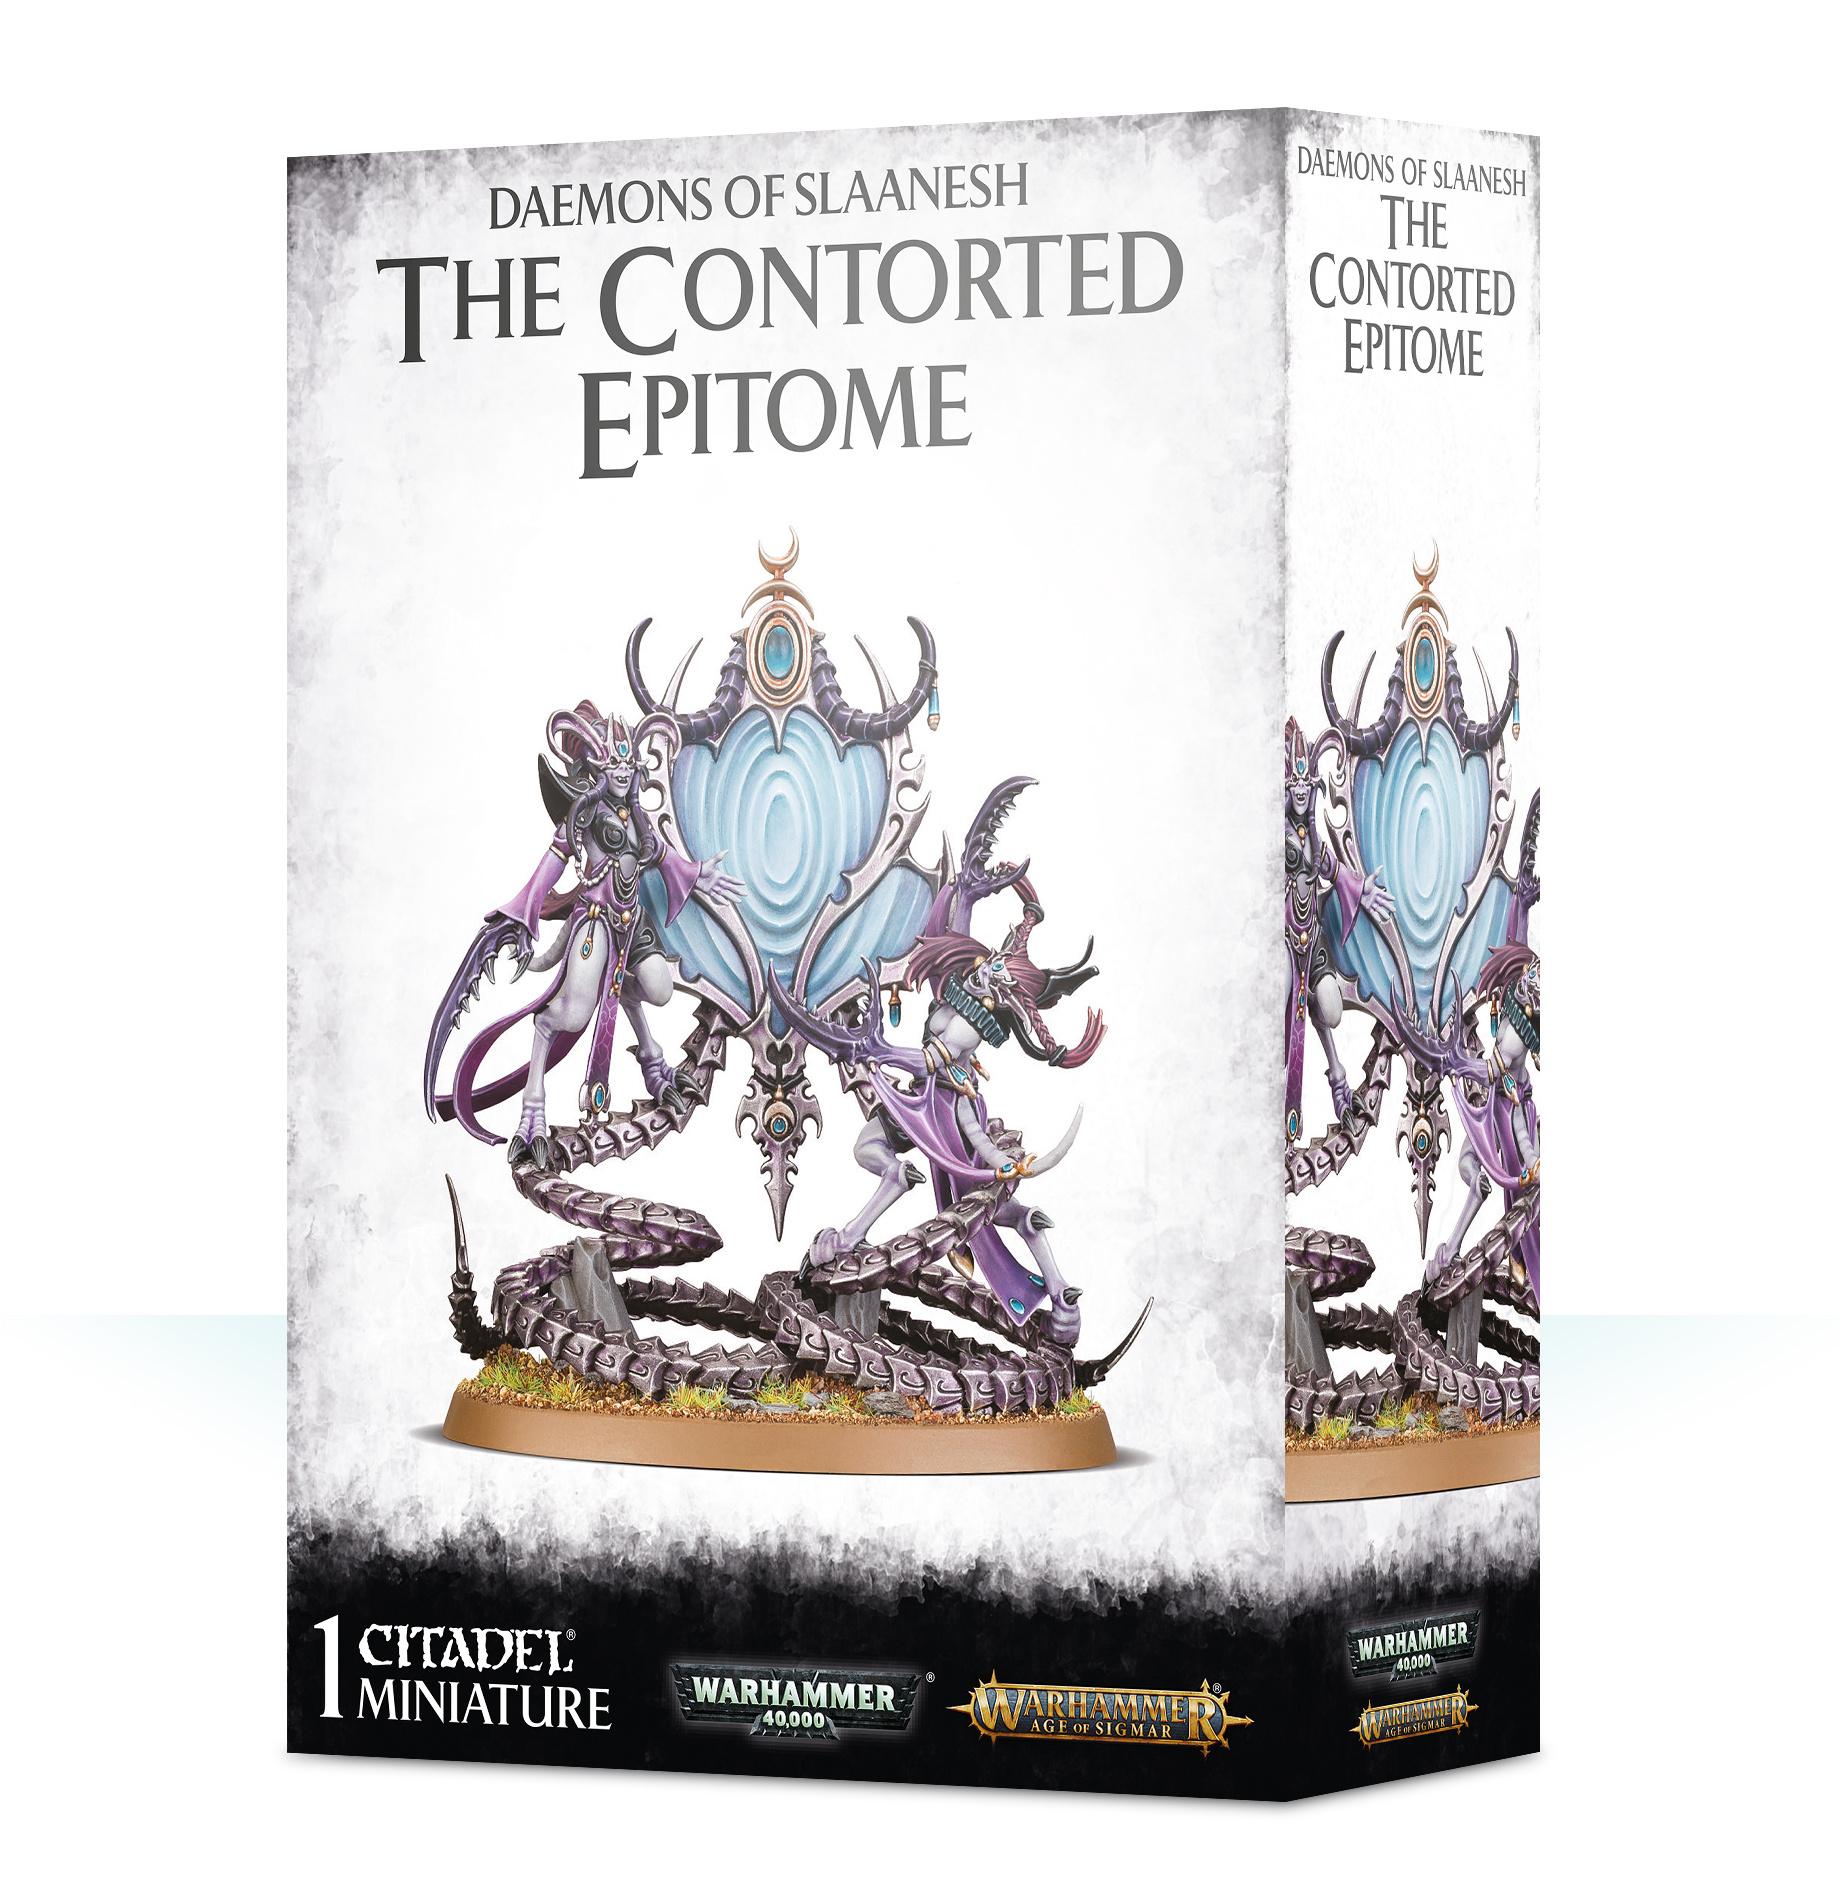 Games-Workshop Daemons/Slaanesh: The Contorted Epitome